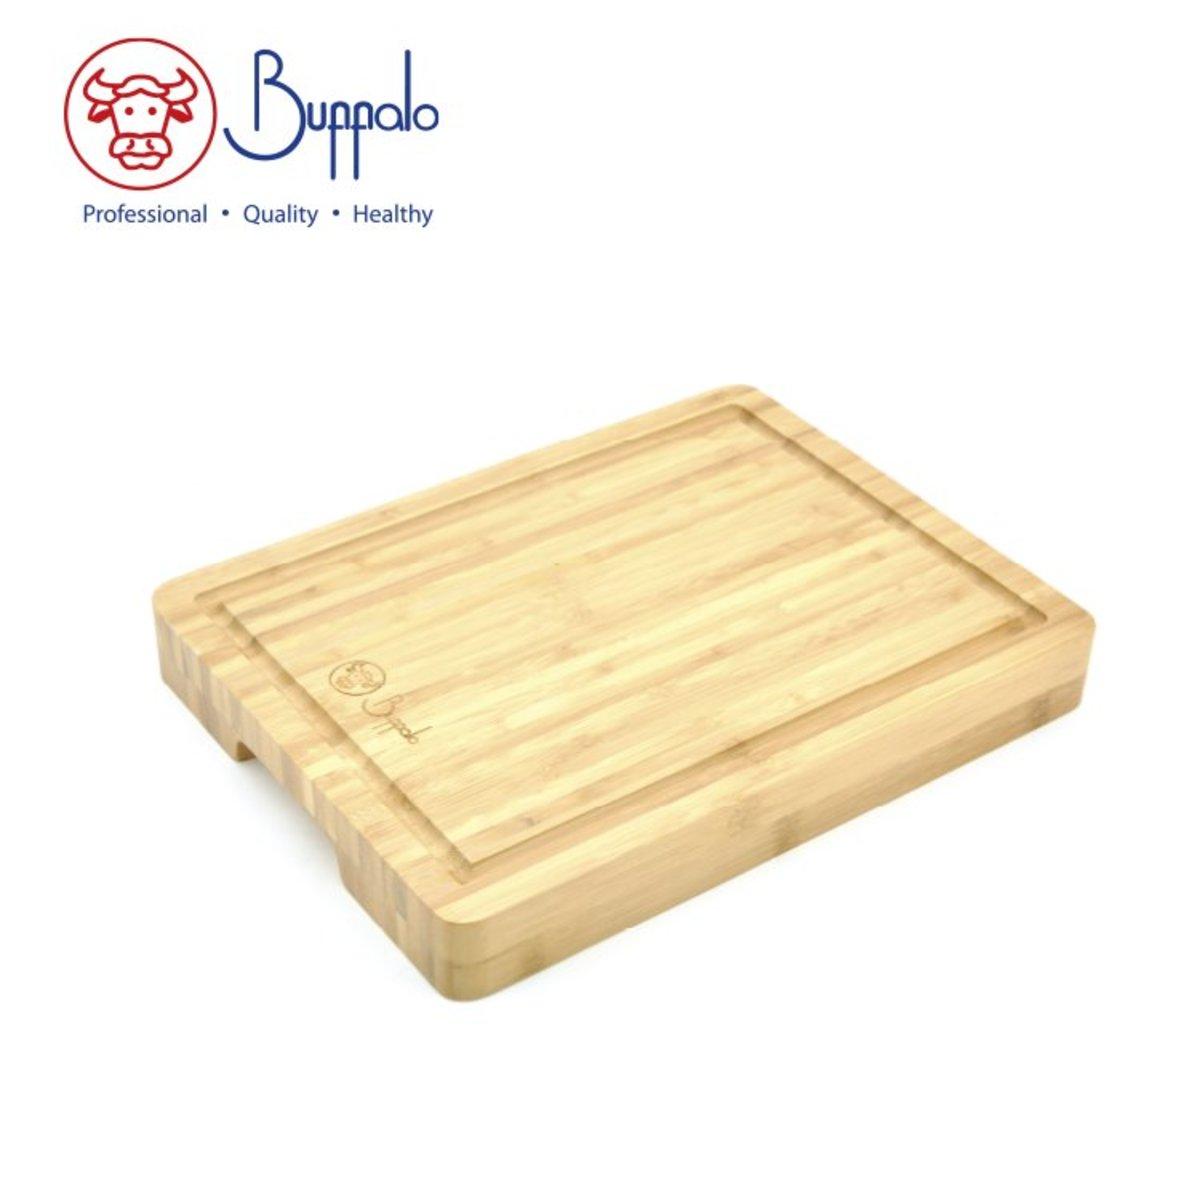 Buffalo- Carbonized Natural Bamboo Chopping Board (40X28X3.8CM) (BF01CB4028)